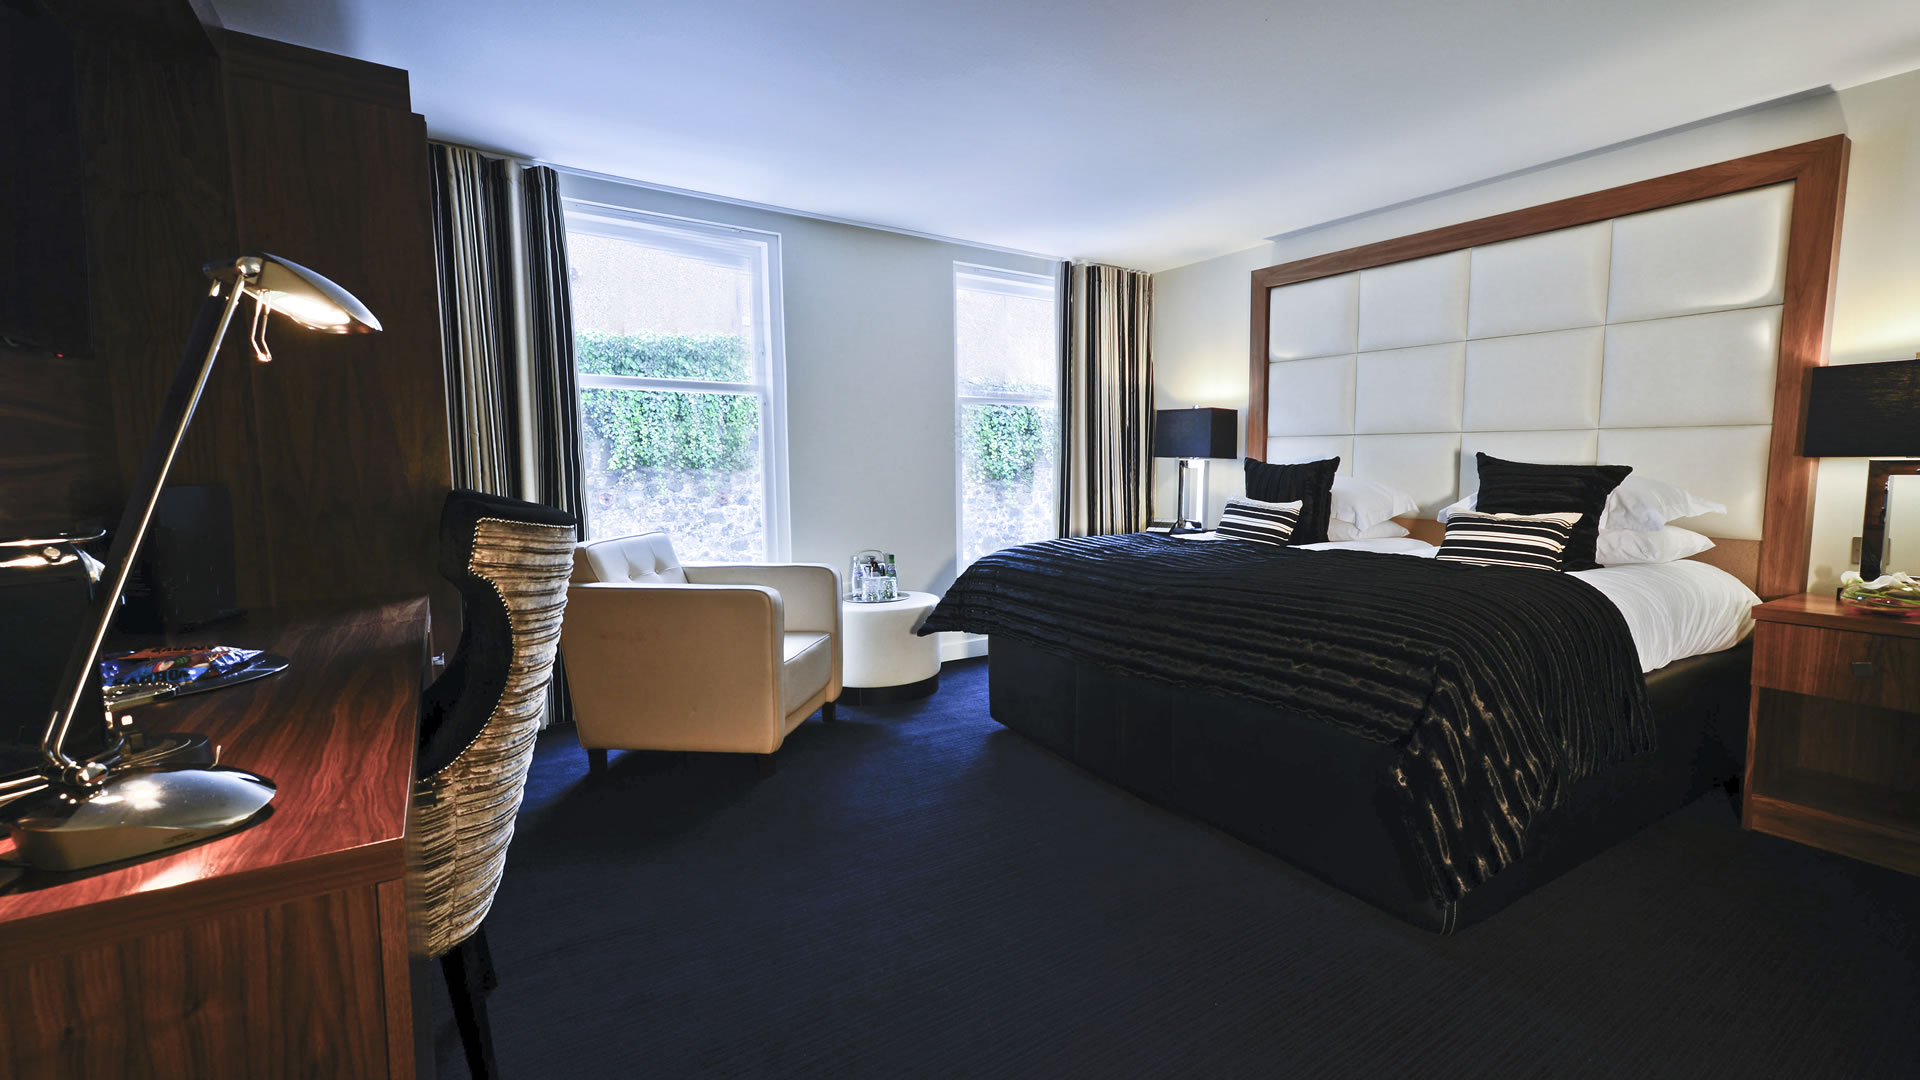 hotelCclessio_Bedroom2_Premium_King_1920x1080